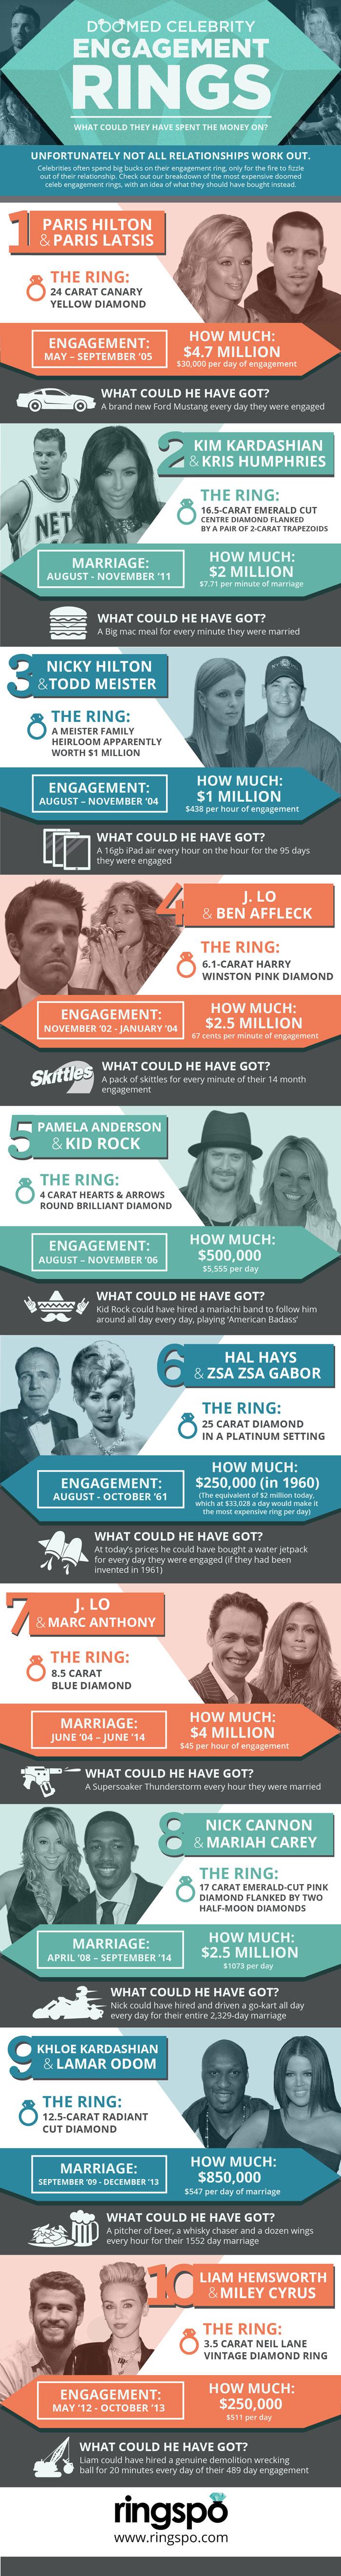 Doomed Celebrity Engagement Rings final 01